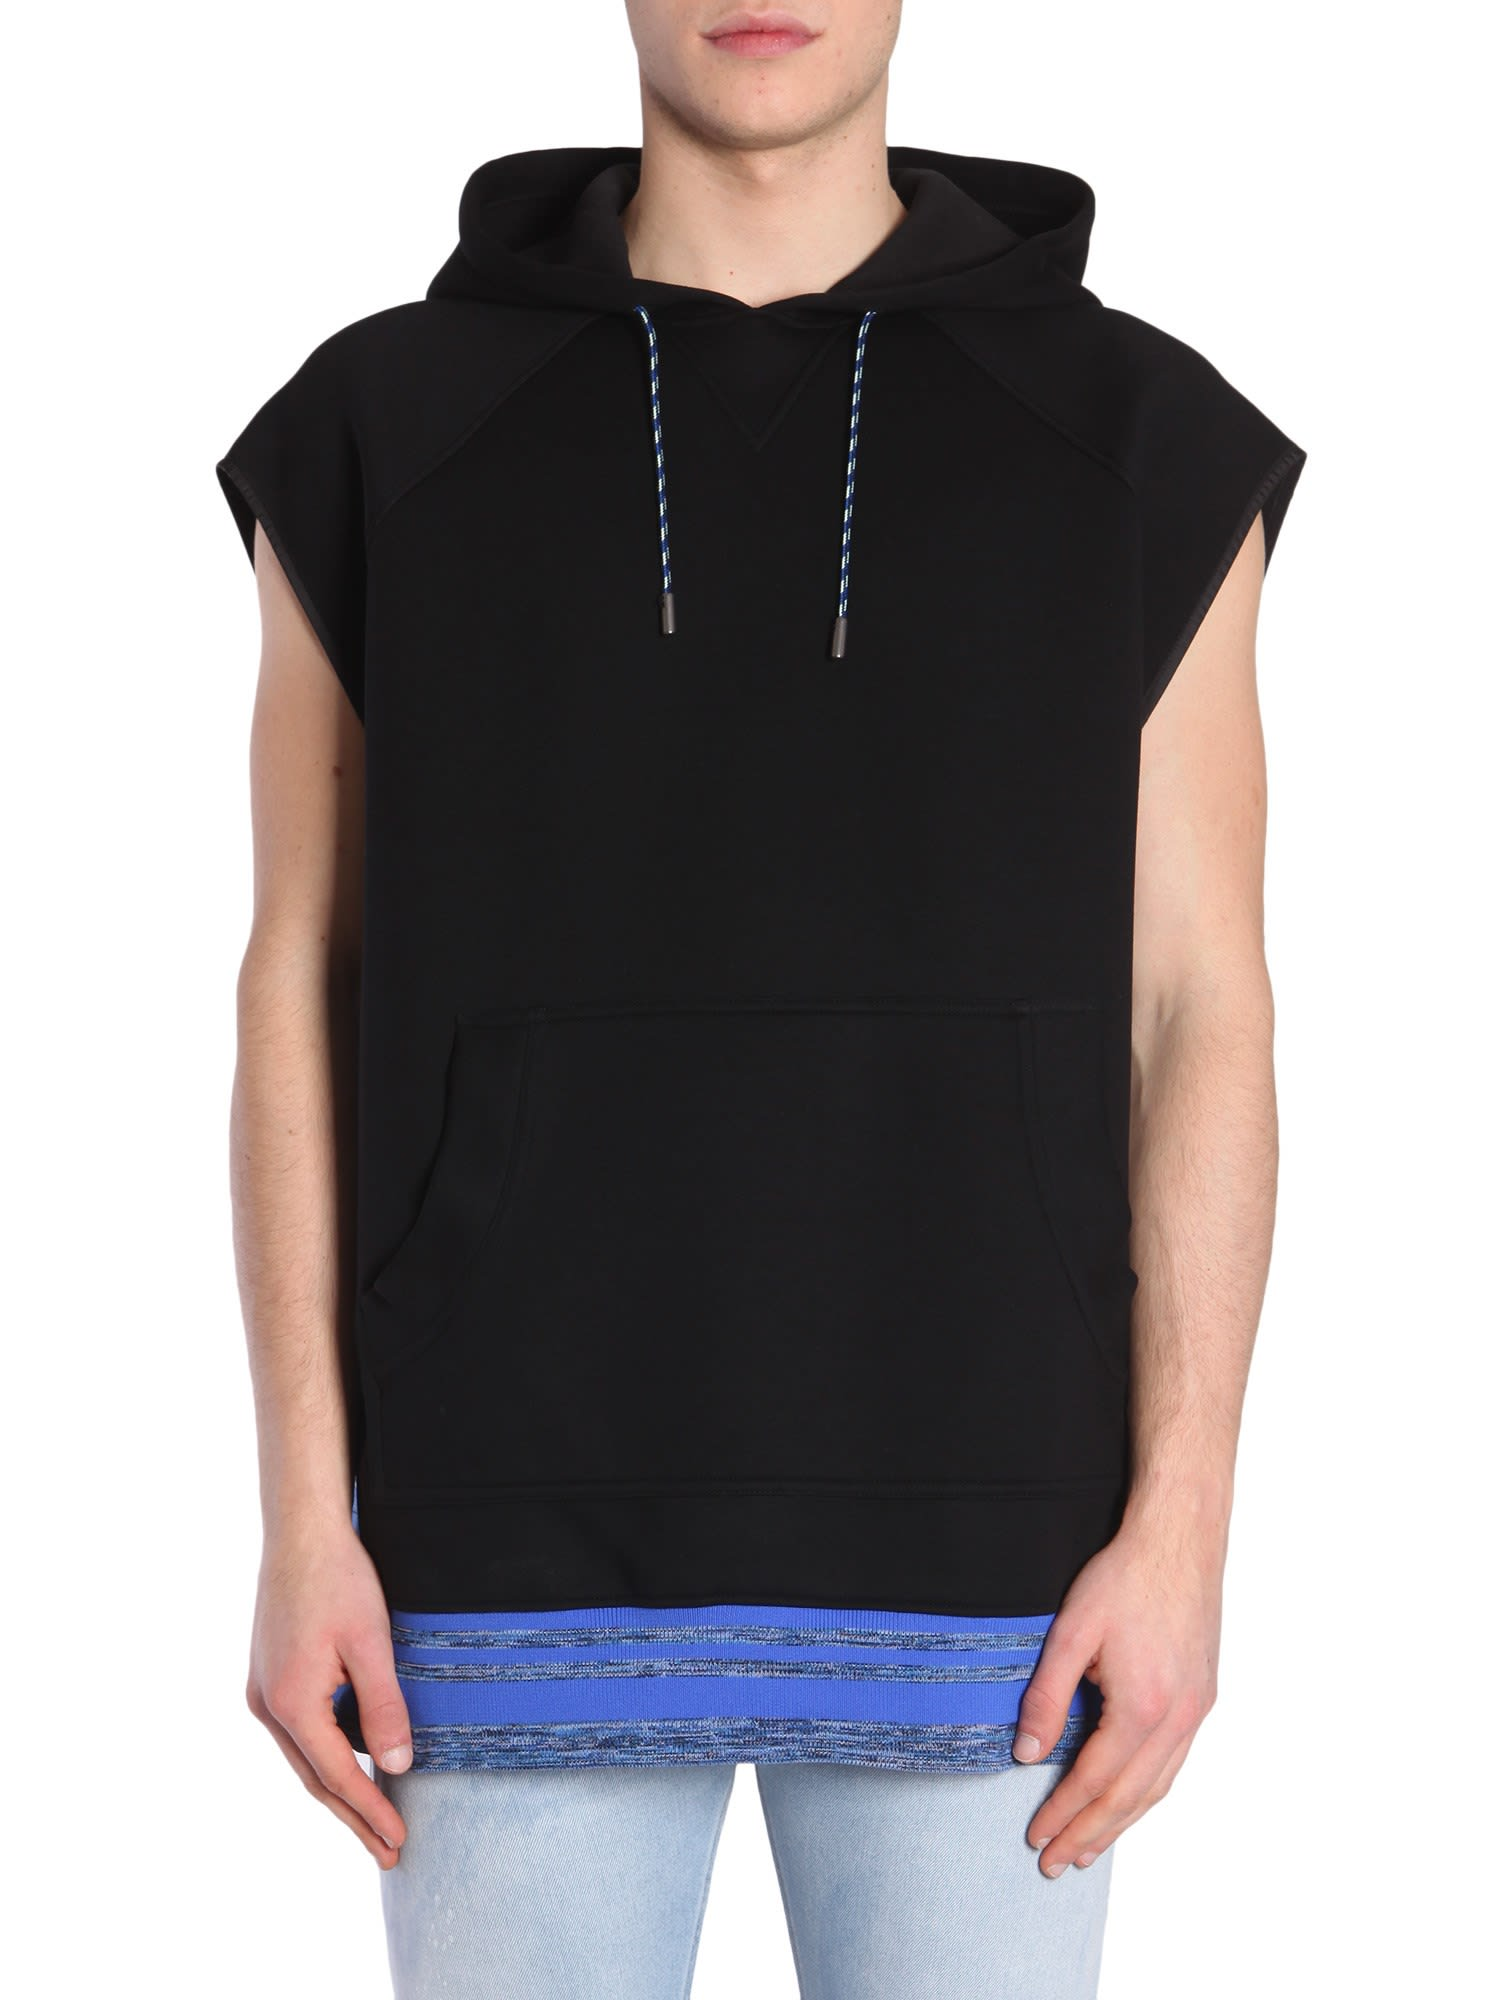 Diesel Black Gold Sio Sweatshirt